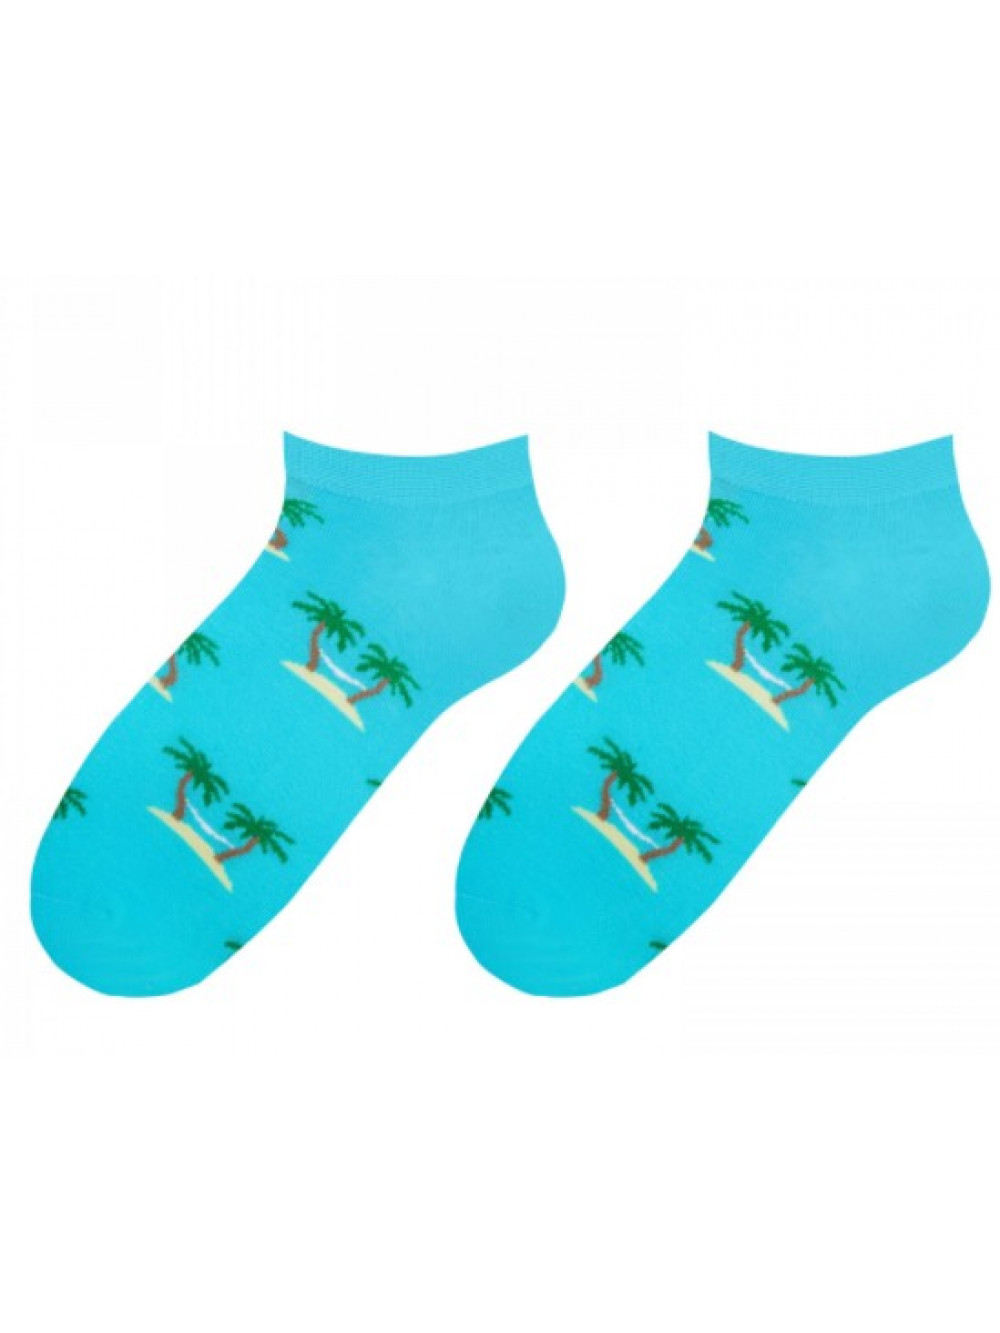 Ponožky More Palm Tree Tyrkys